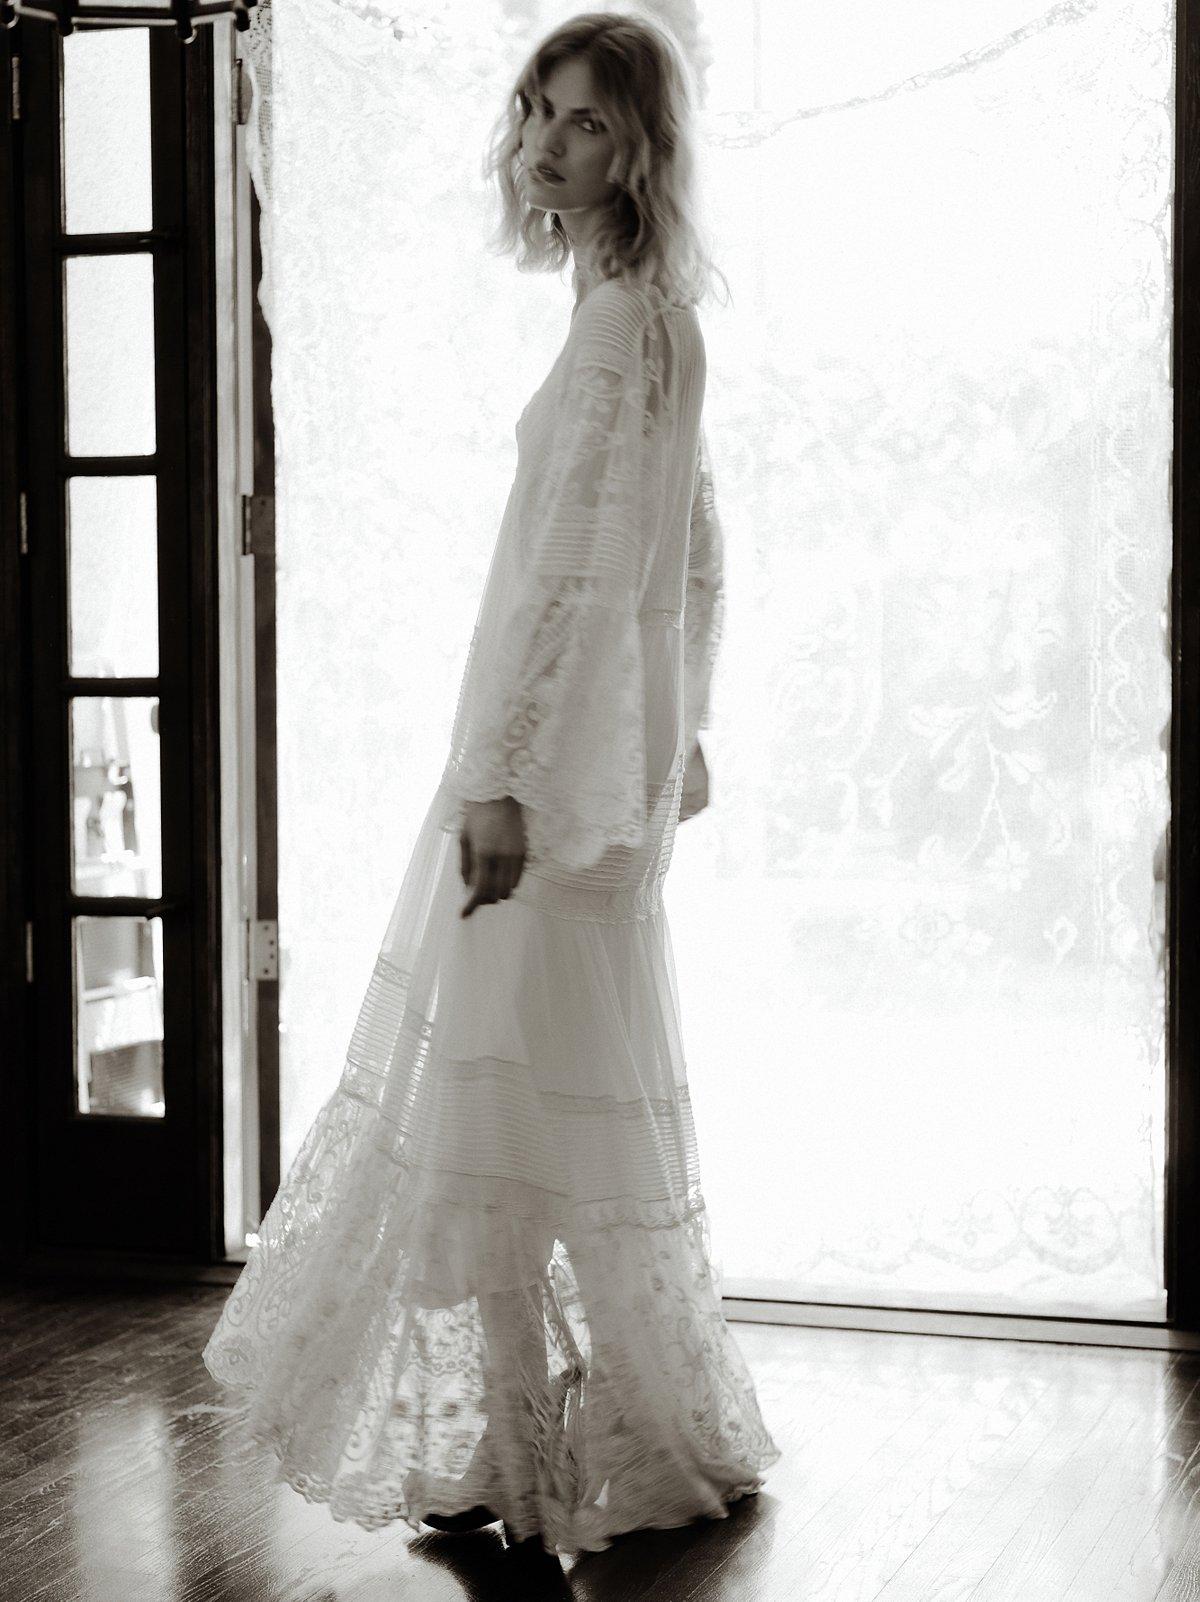 Magnolia礼服